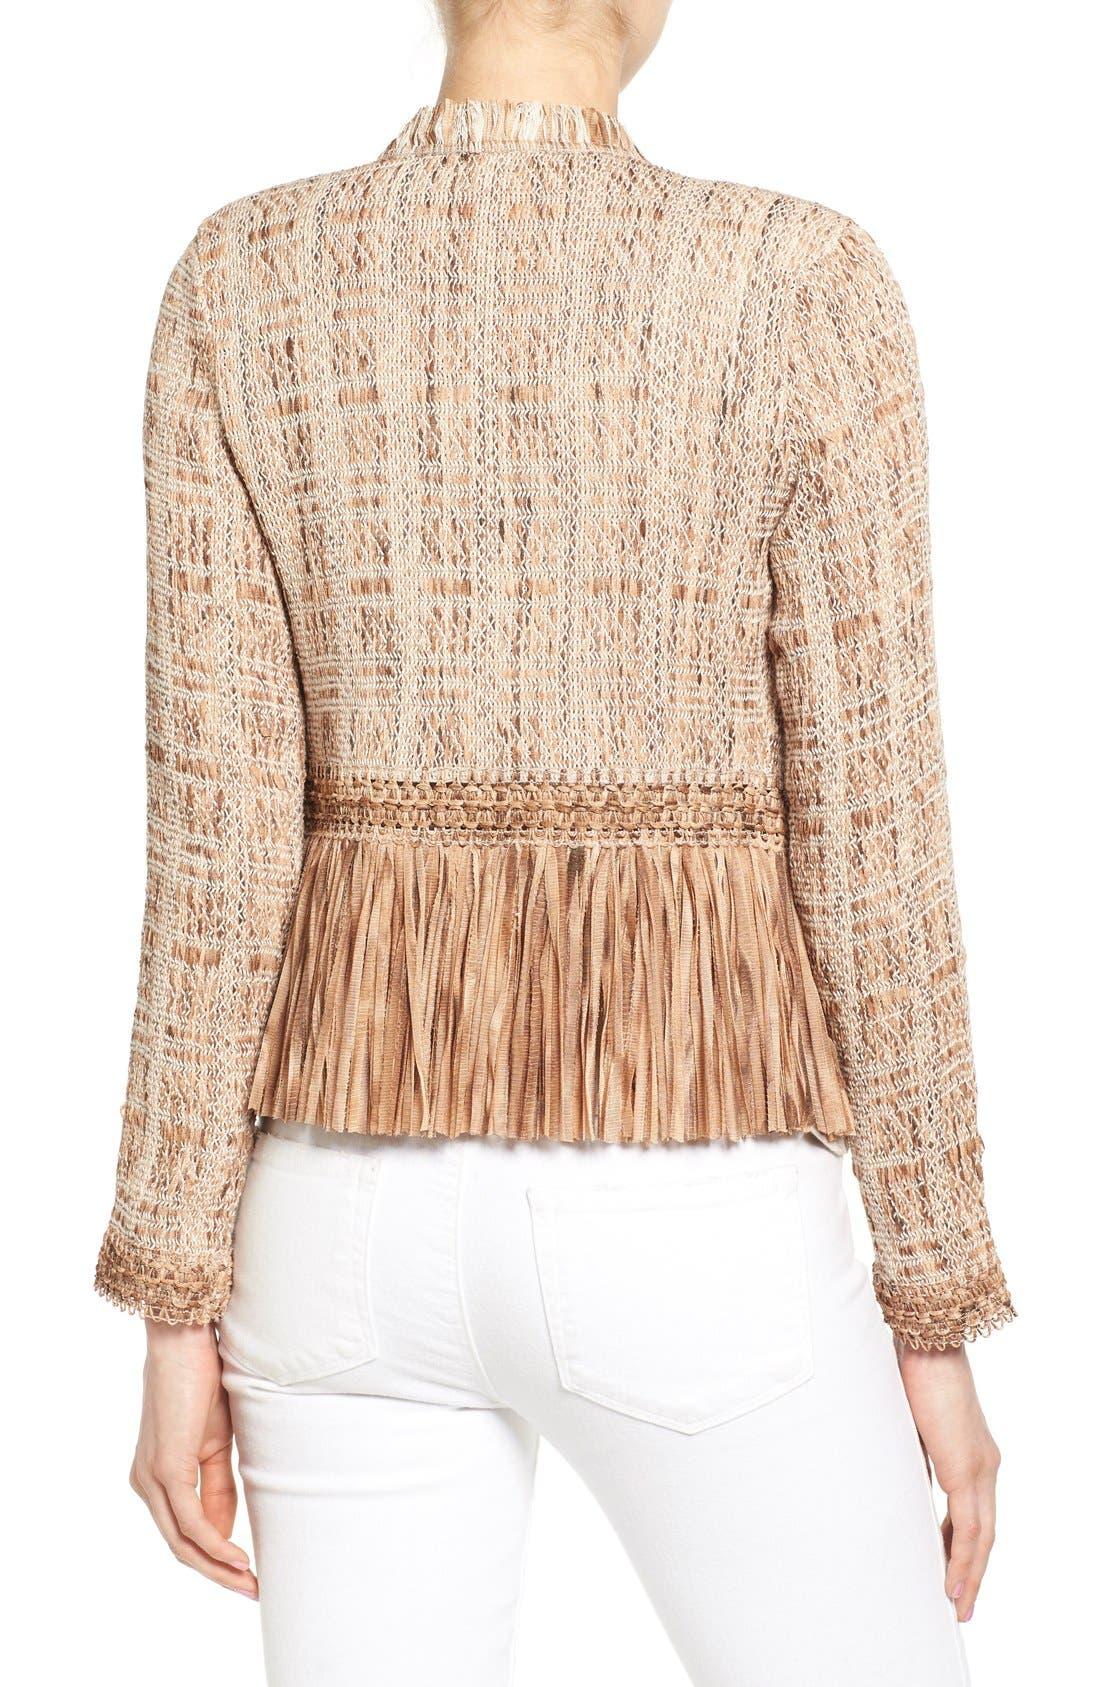 Alternate Image 2  - NIC+ZOE 'Cork' Fringe Tweed Jacket (Regular & Petite)